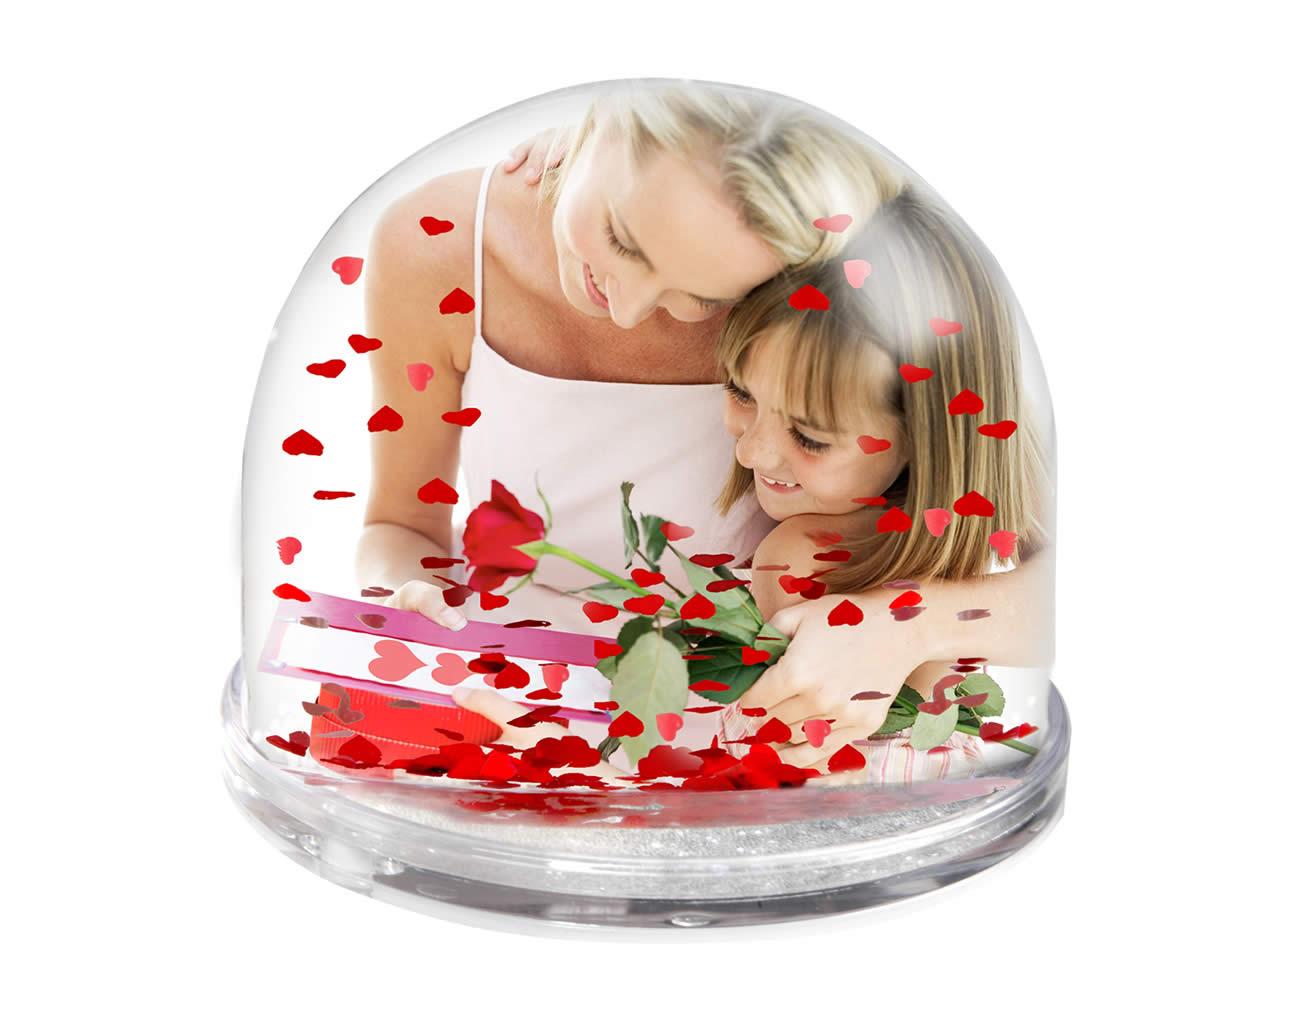 аналог снежного шара с сердечками